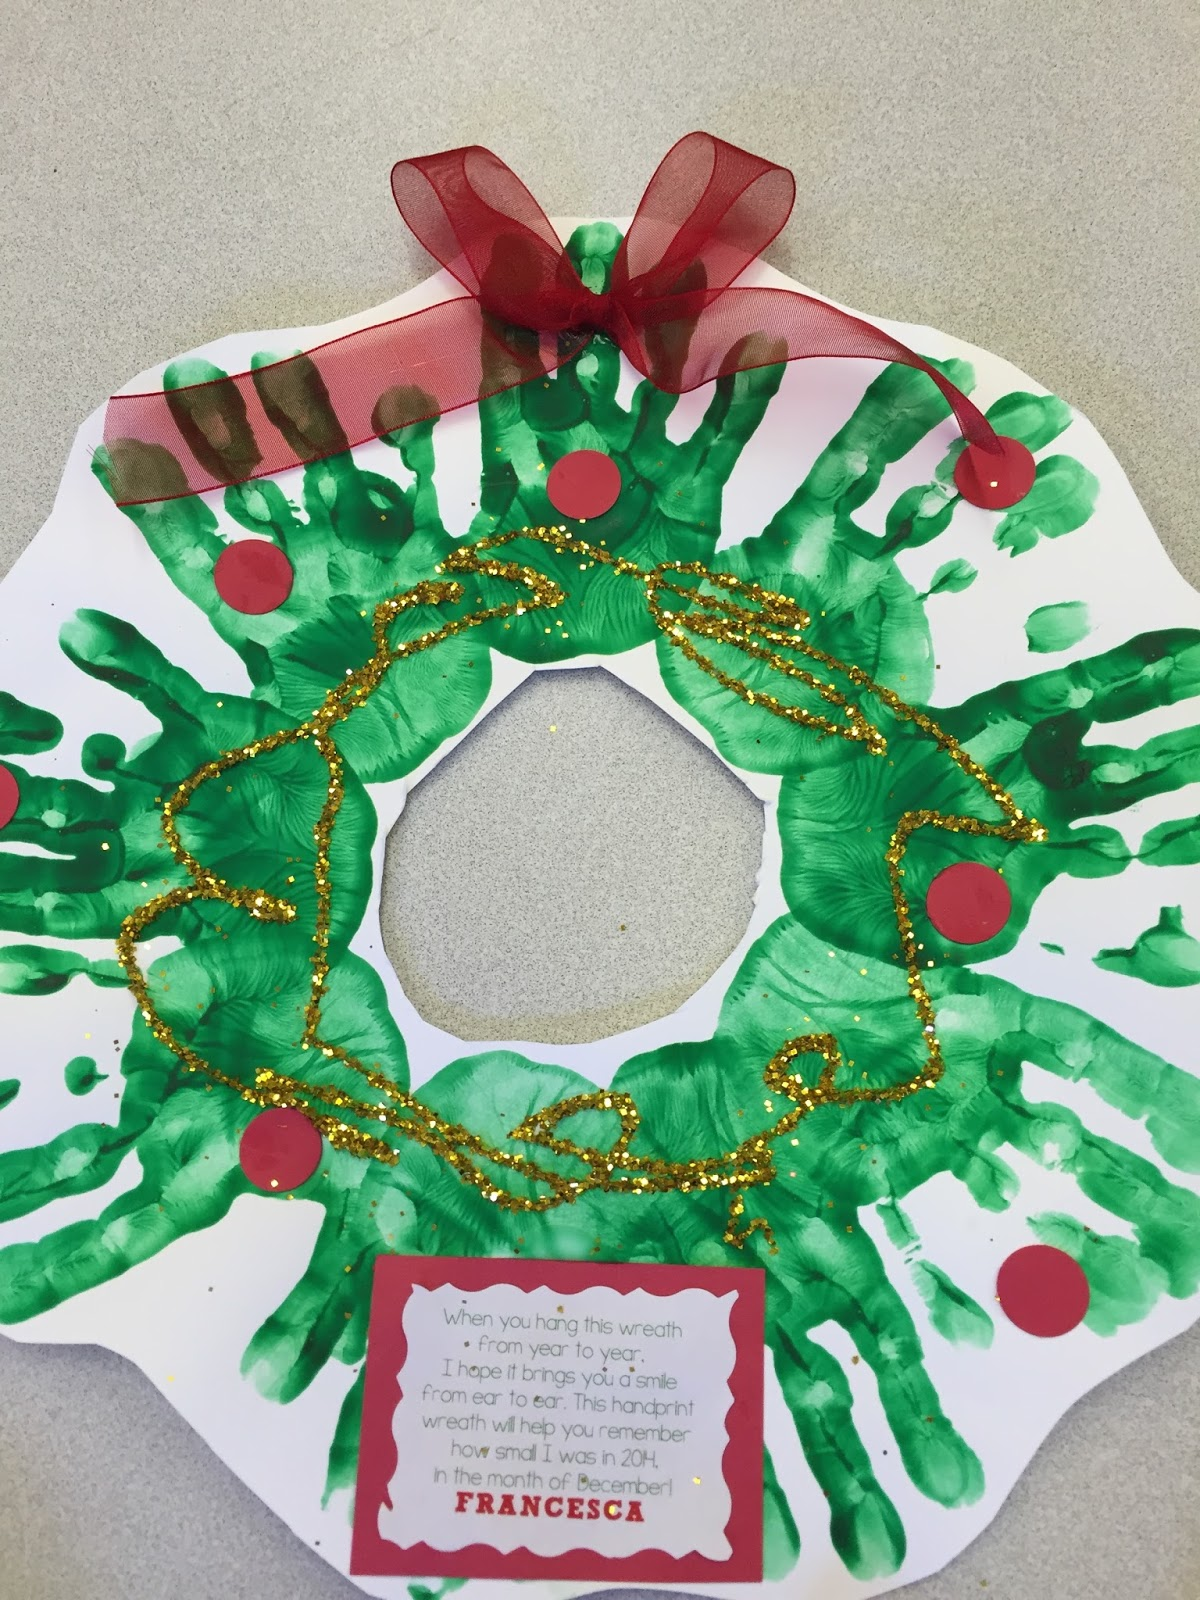 Terrific Preschool Years: Celebrating Christmas